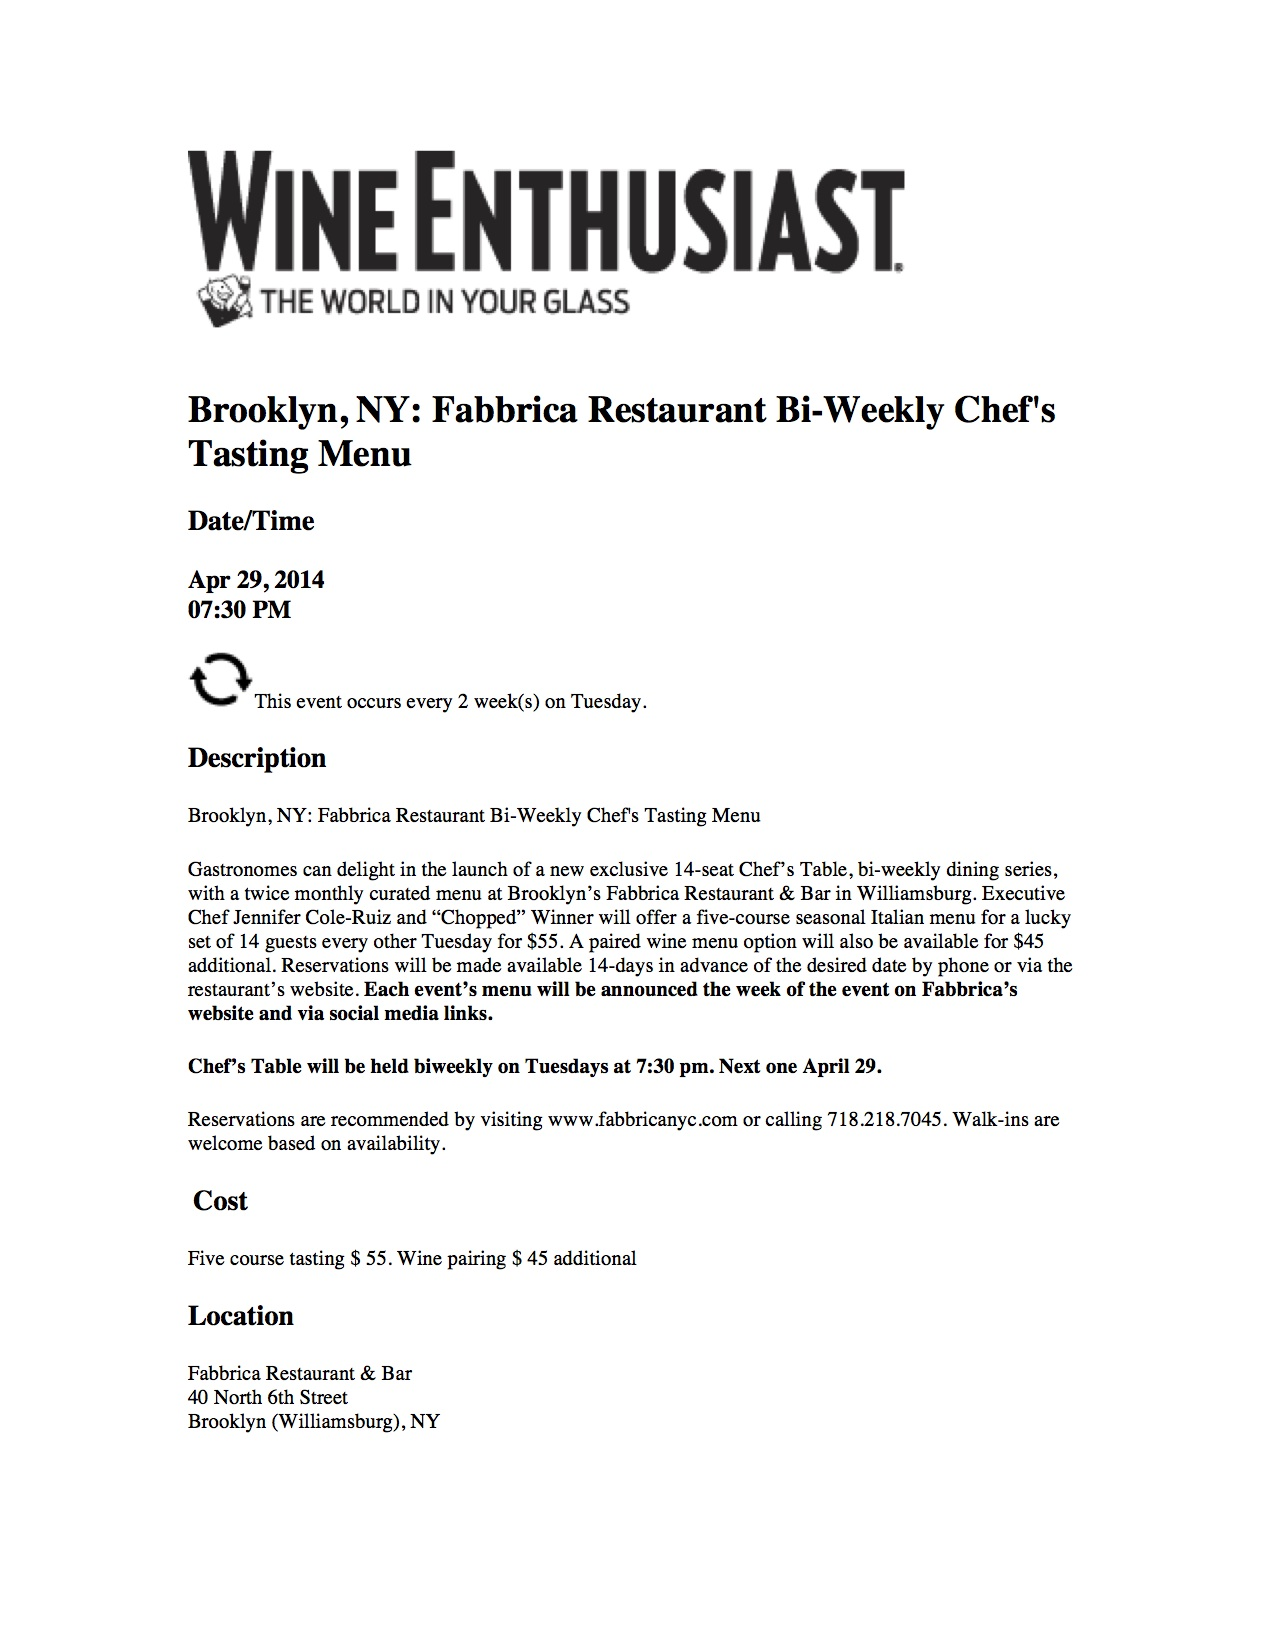 FABBRICA - WineEnthusiast - 4.29.14.jpg